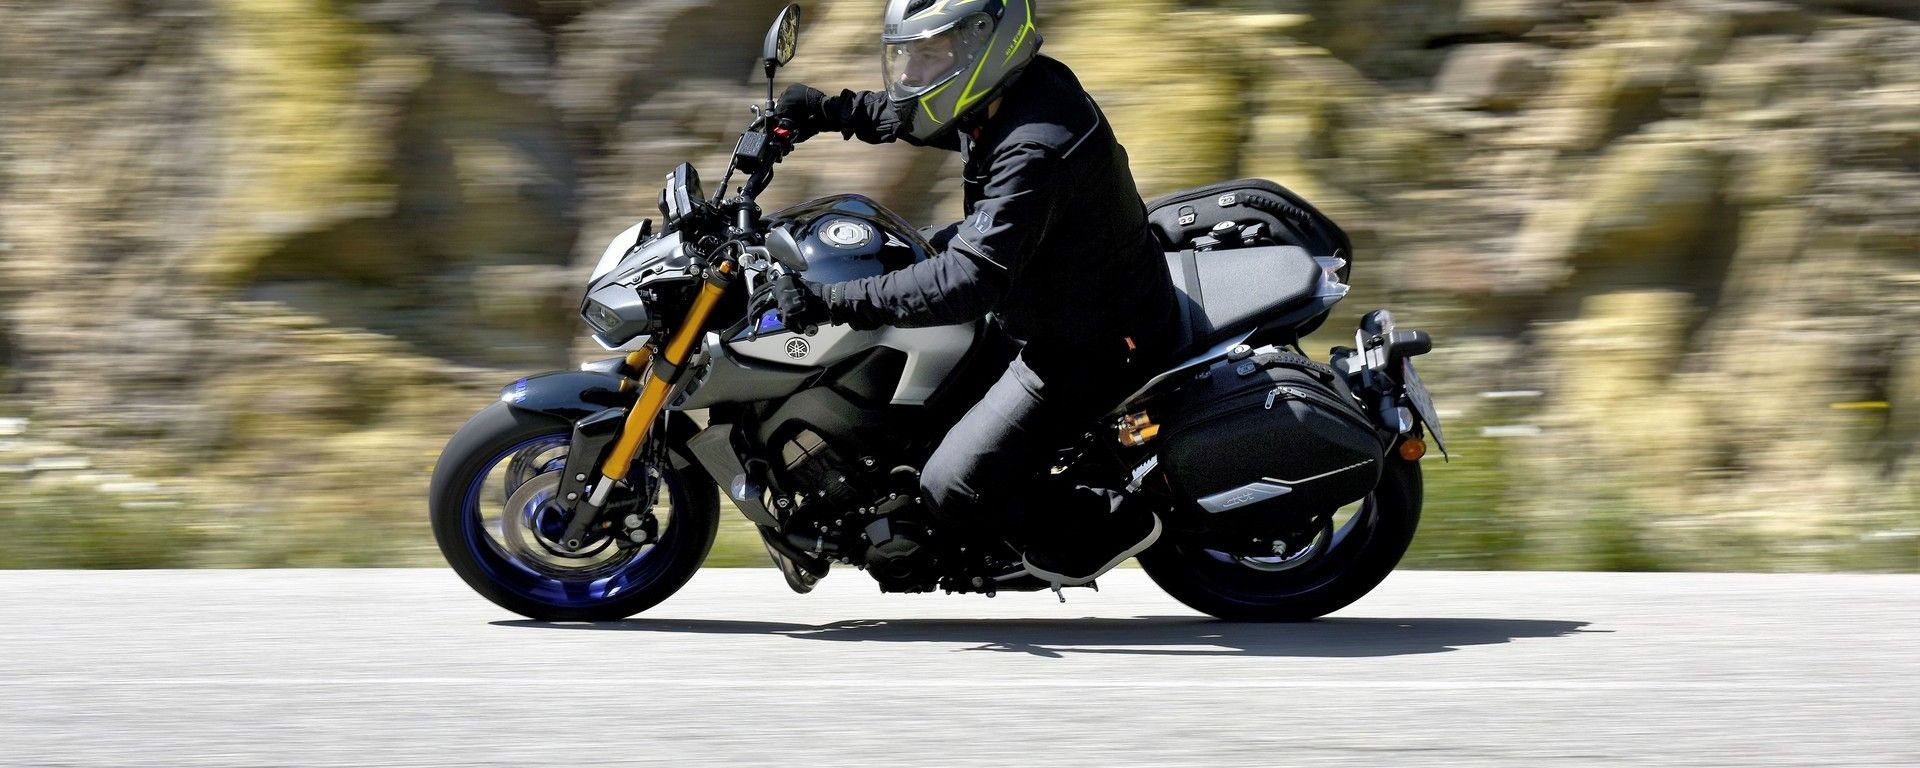 Yamaha MT-09 SP in piega